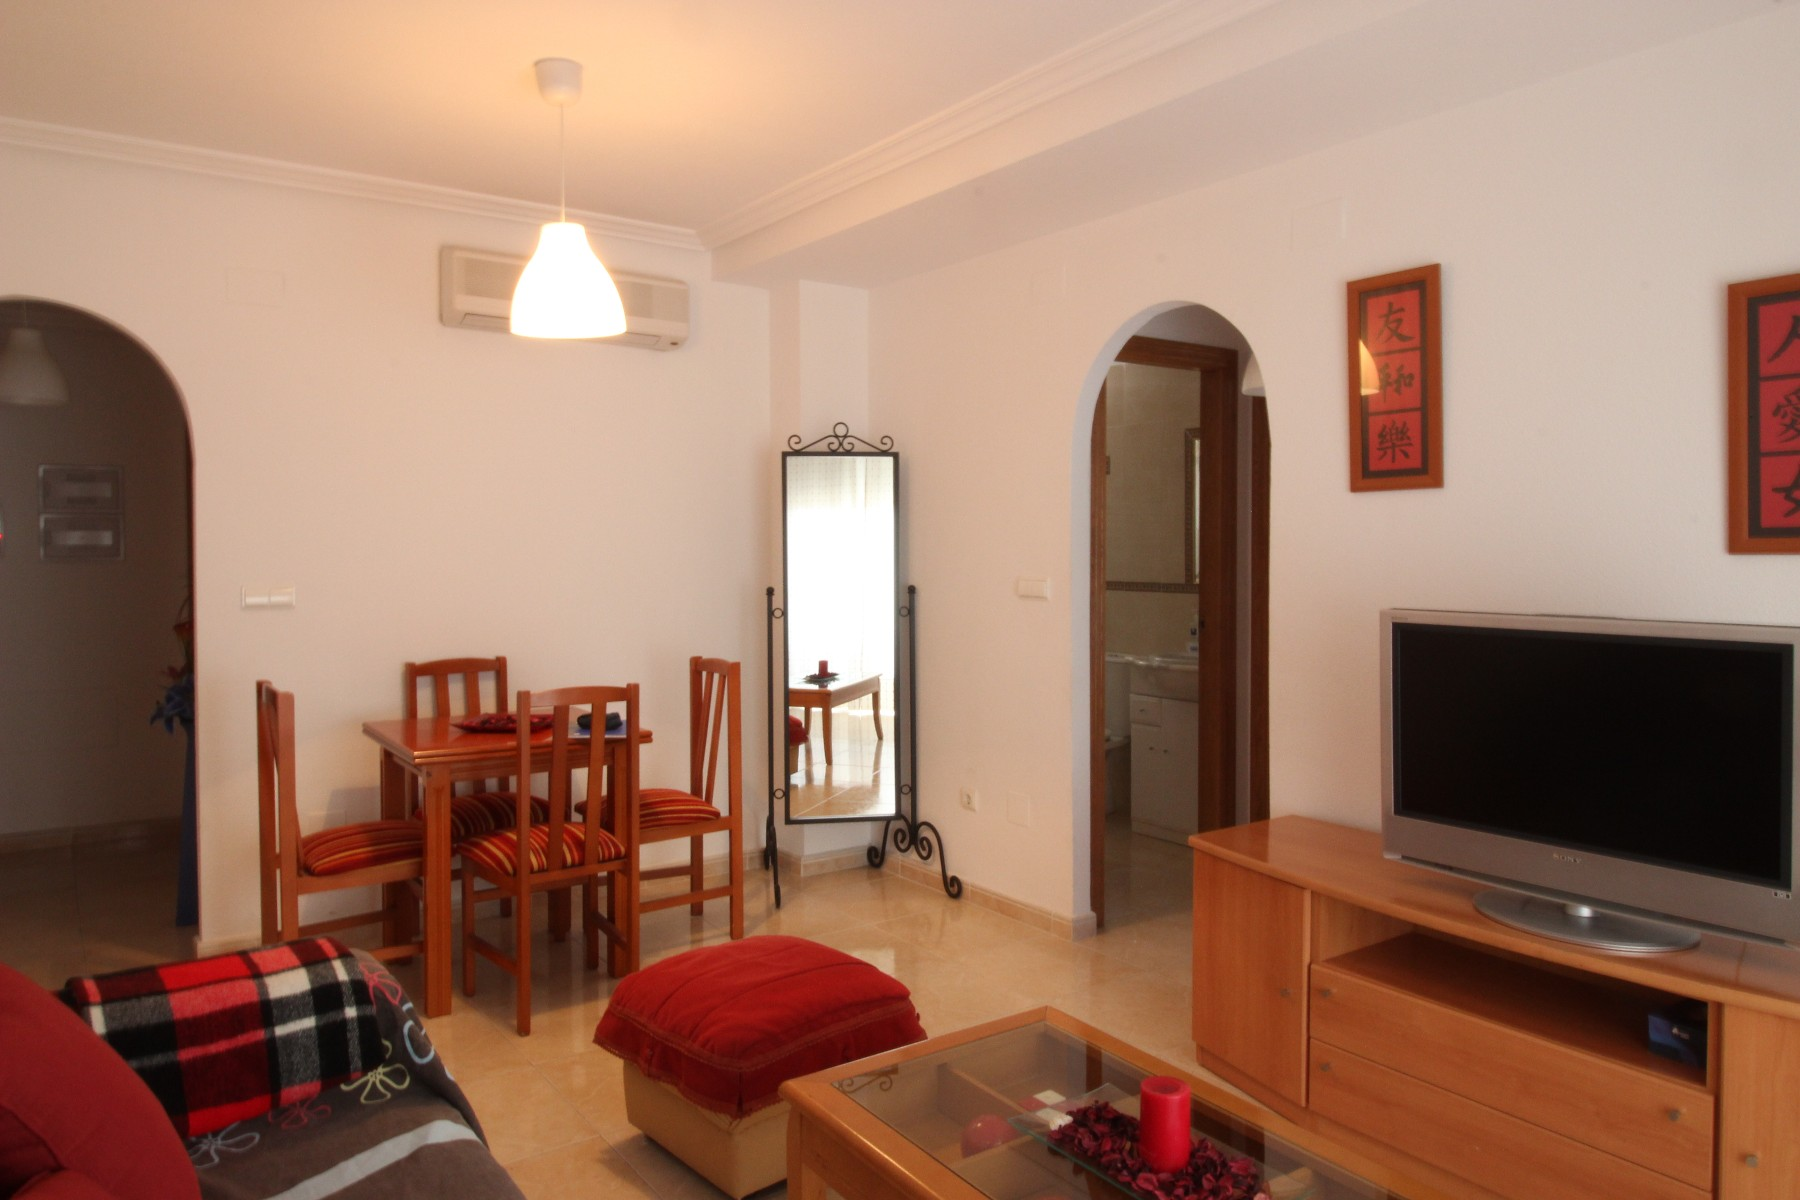 2 Slaapkamer Appartement in Guardamar del Segura in Nexus Grupo